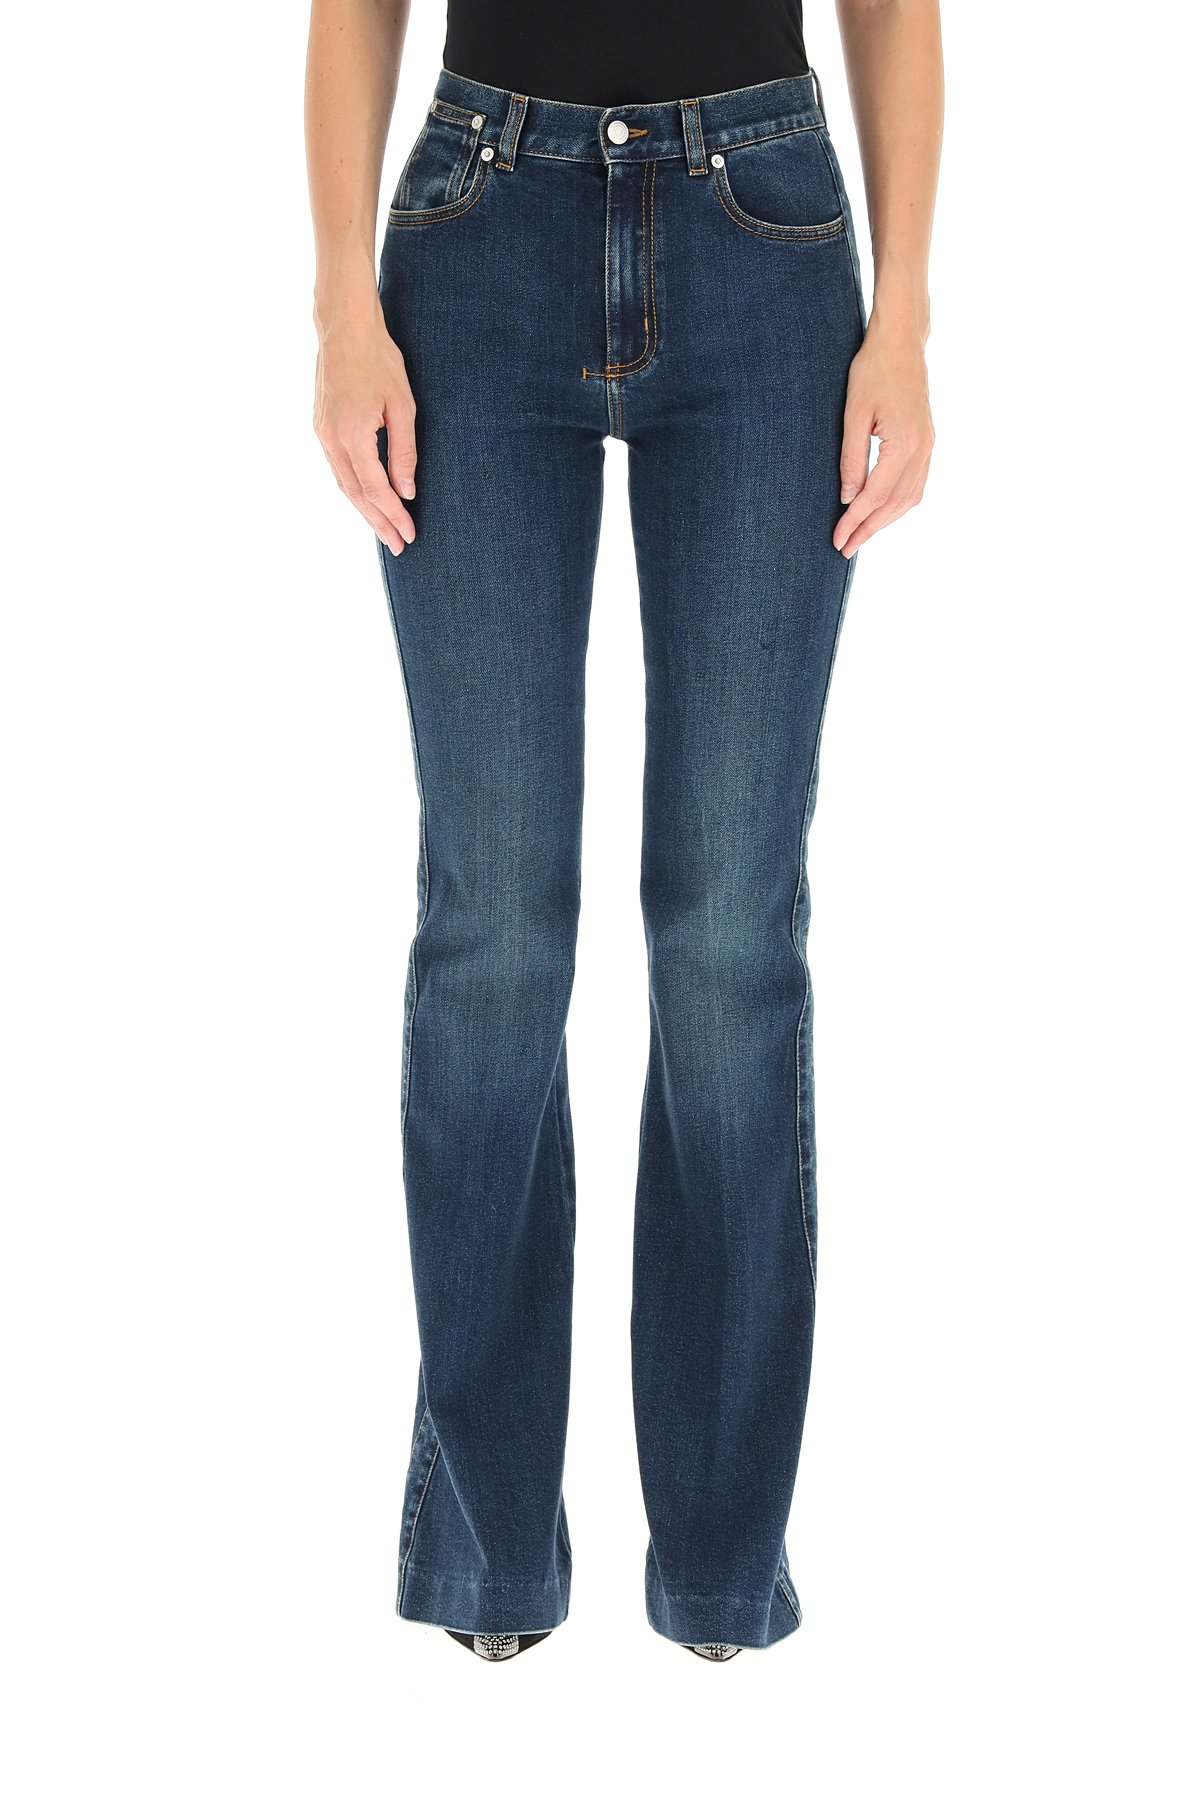 Alexander mcqueen jeans flare a vita alta